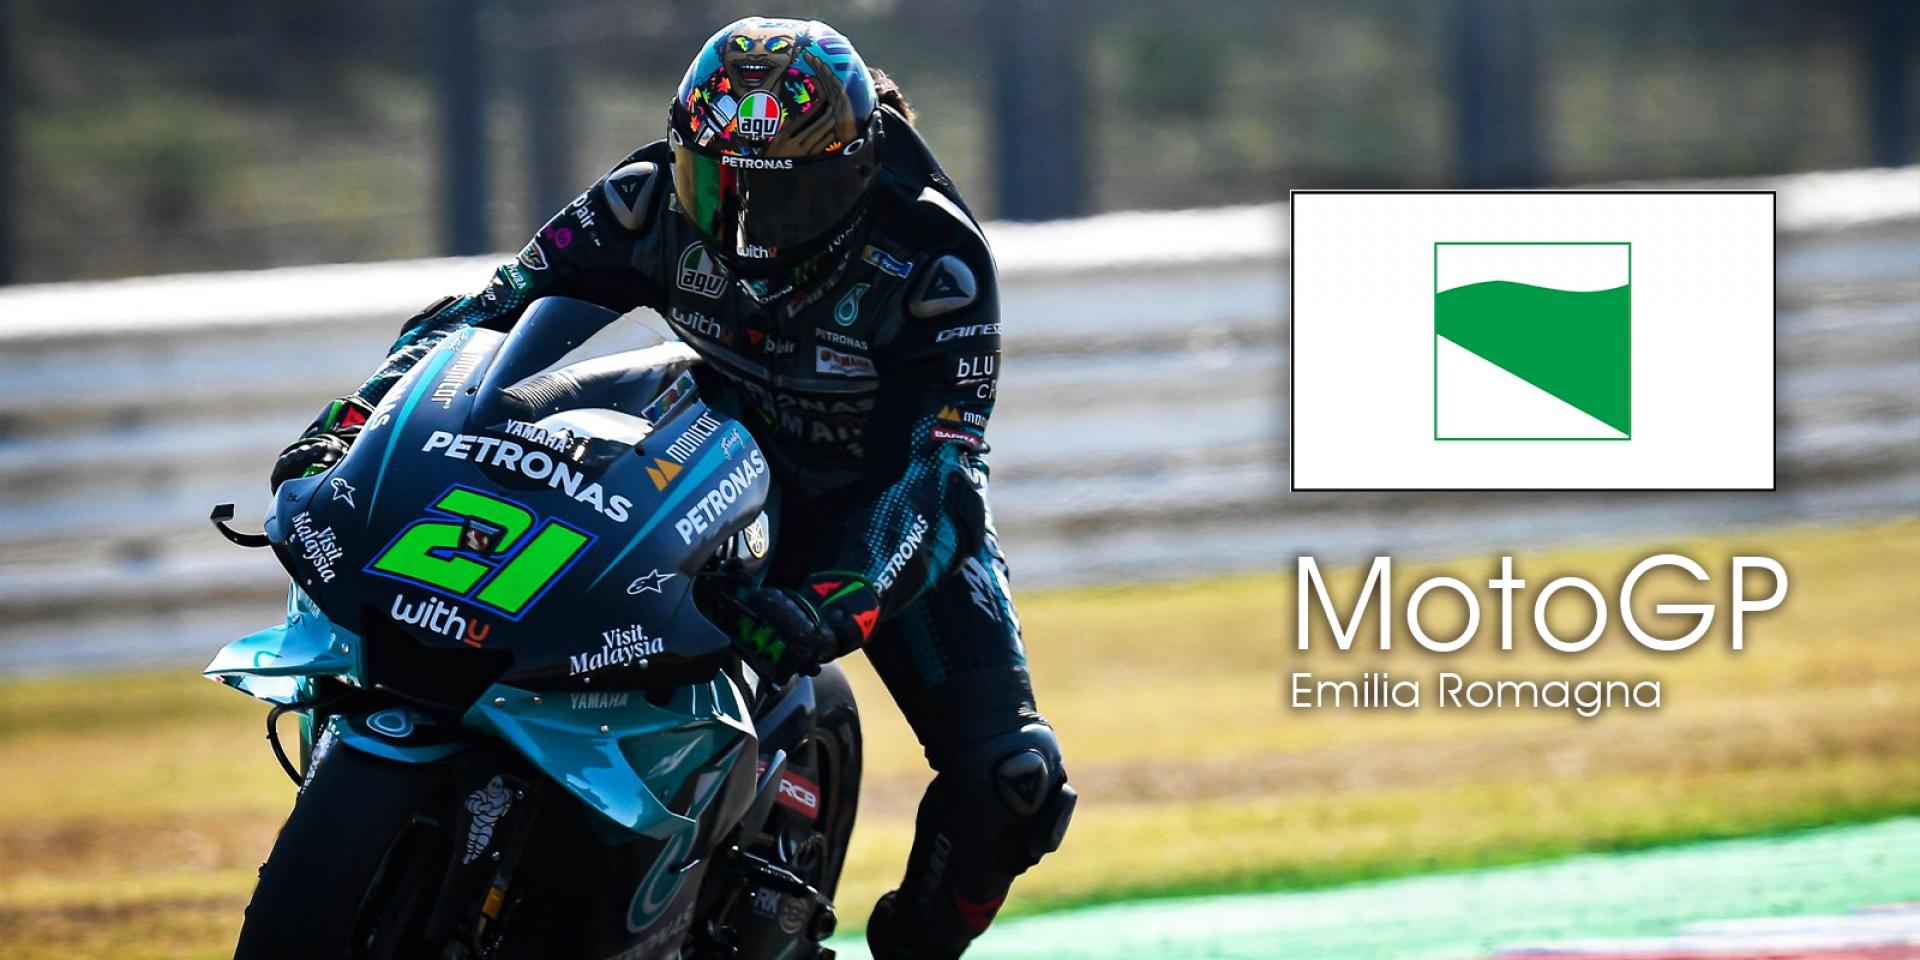 MotoGP 2020 艾米利亞-羅曼尼亞站 轉播時間